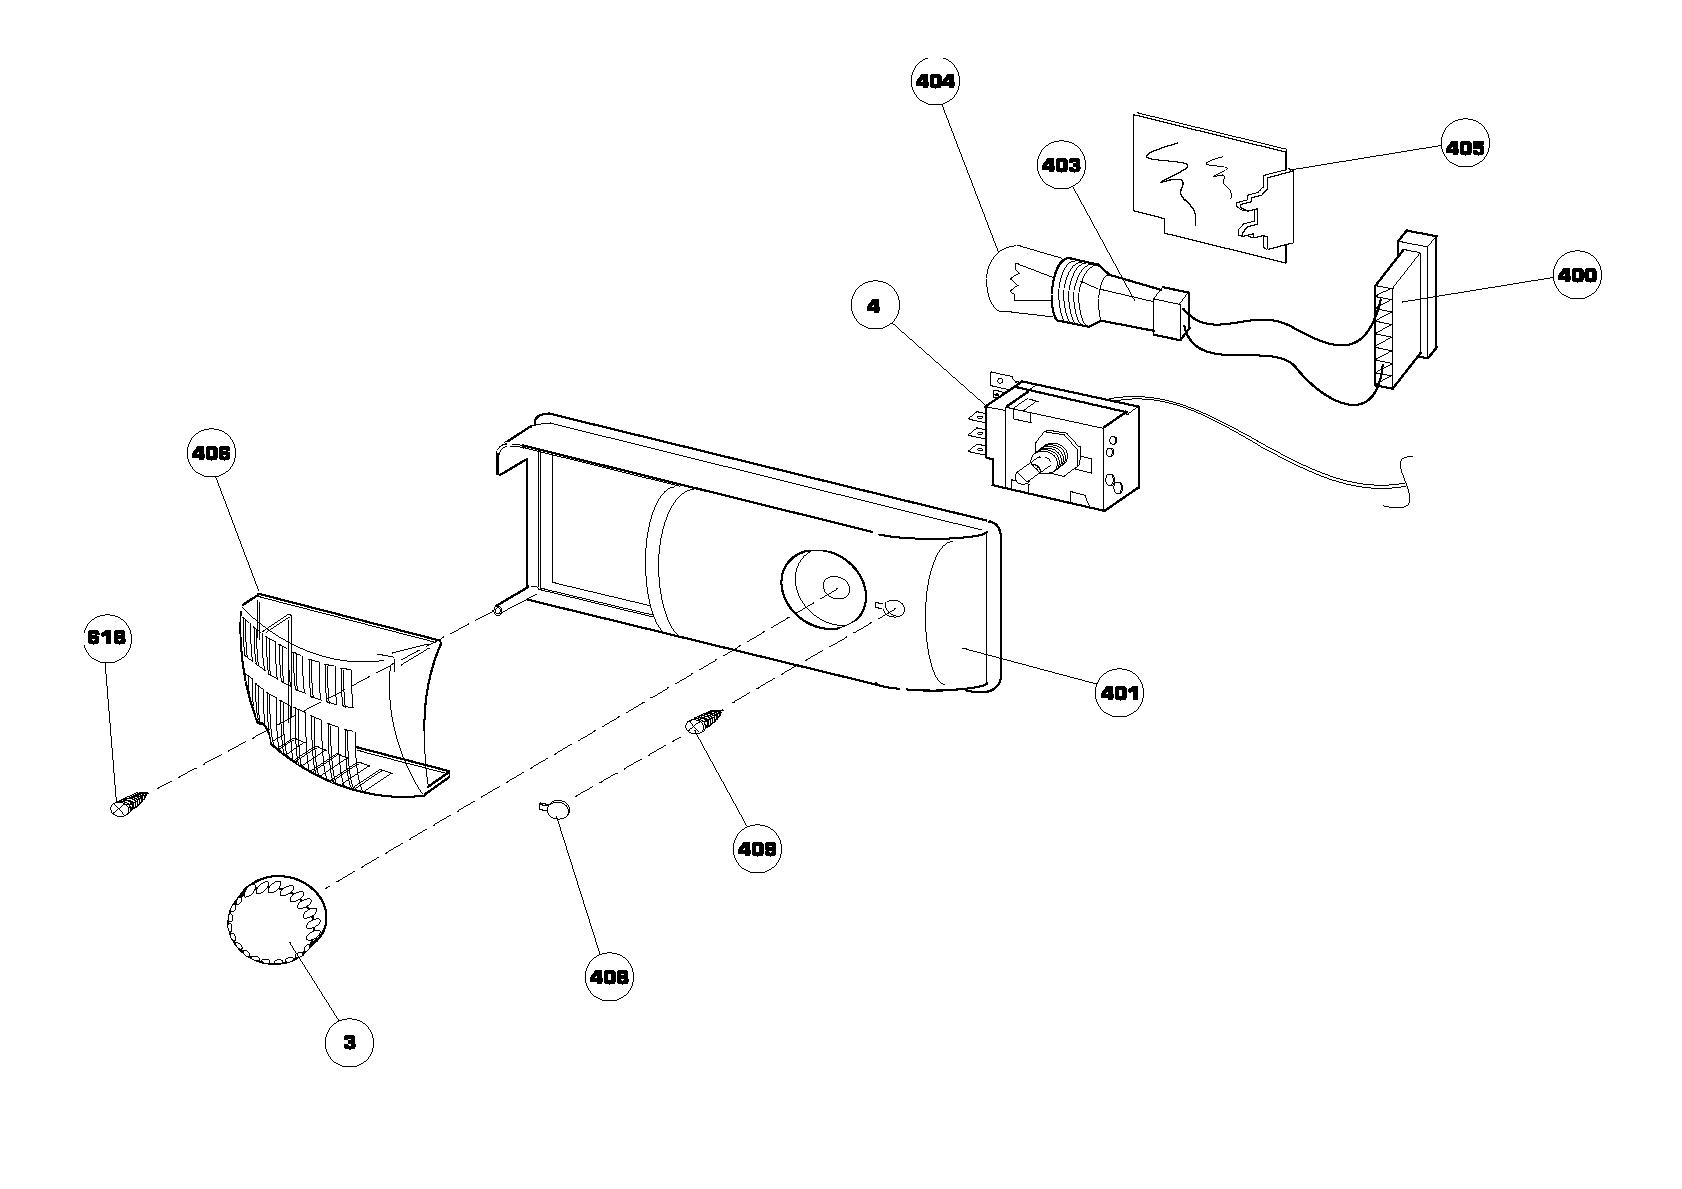 Beko Cn260 Fridge Spares Freezer K59 Thermostat Wiring Diagram